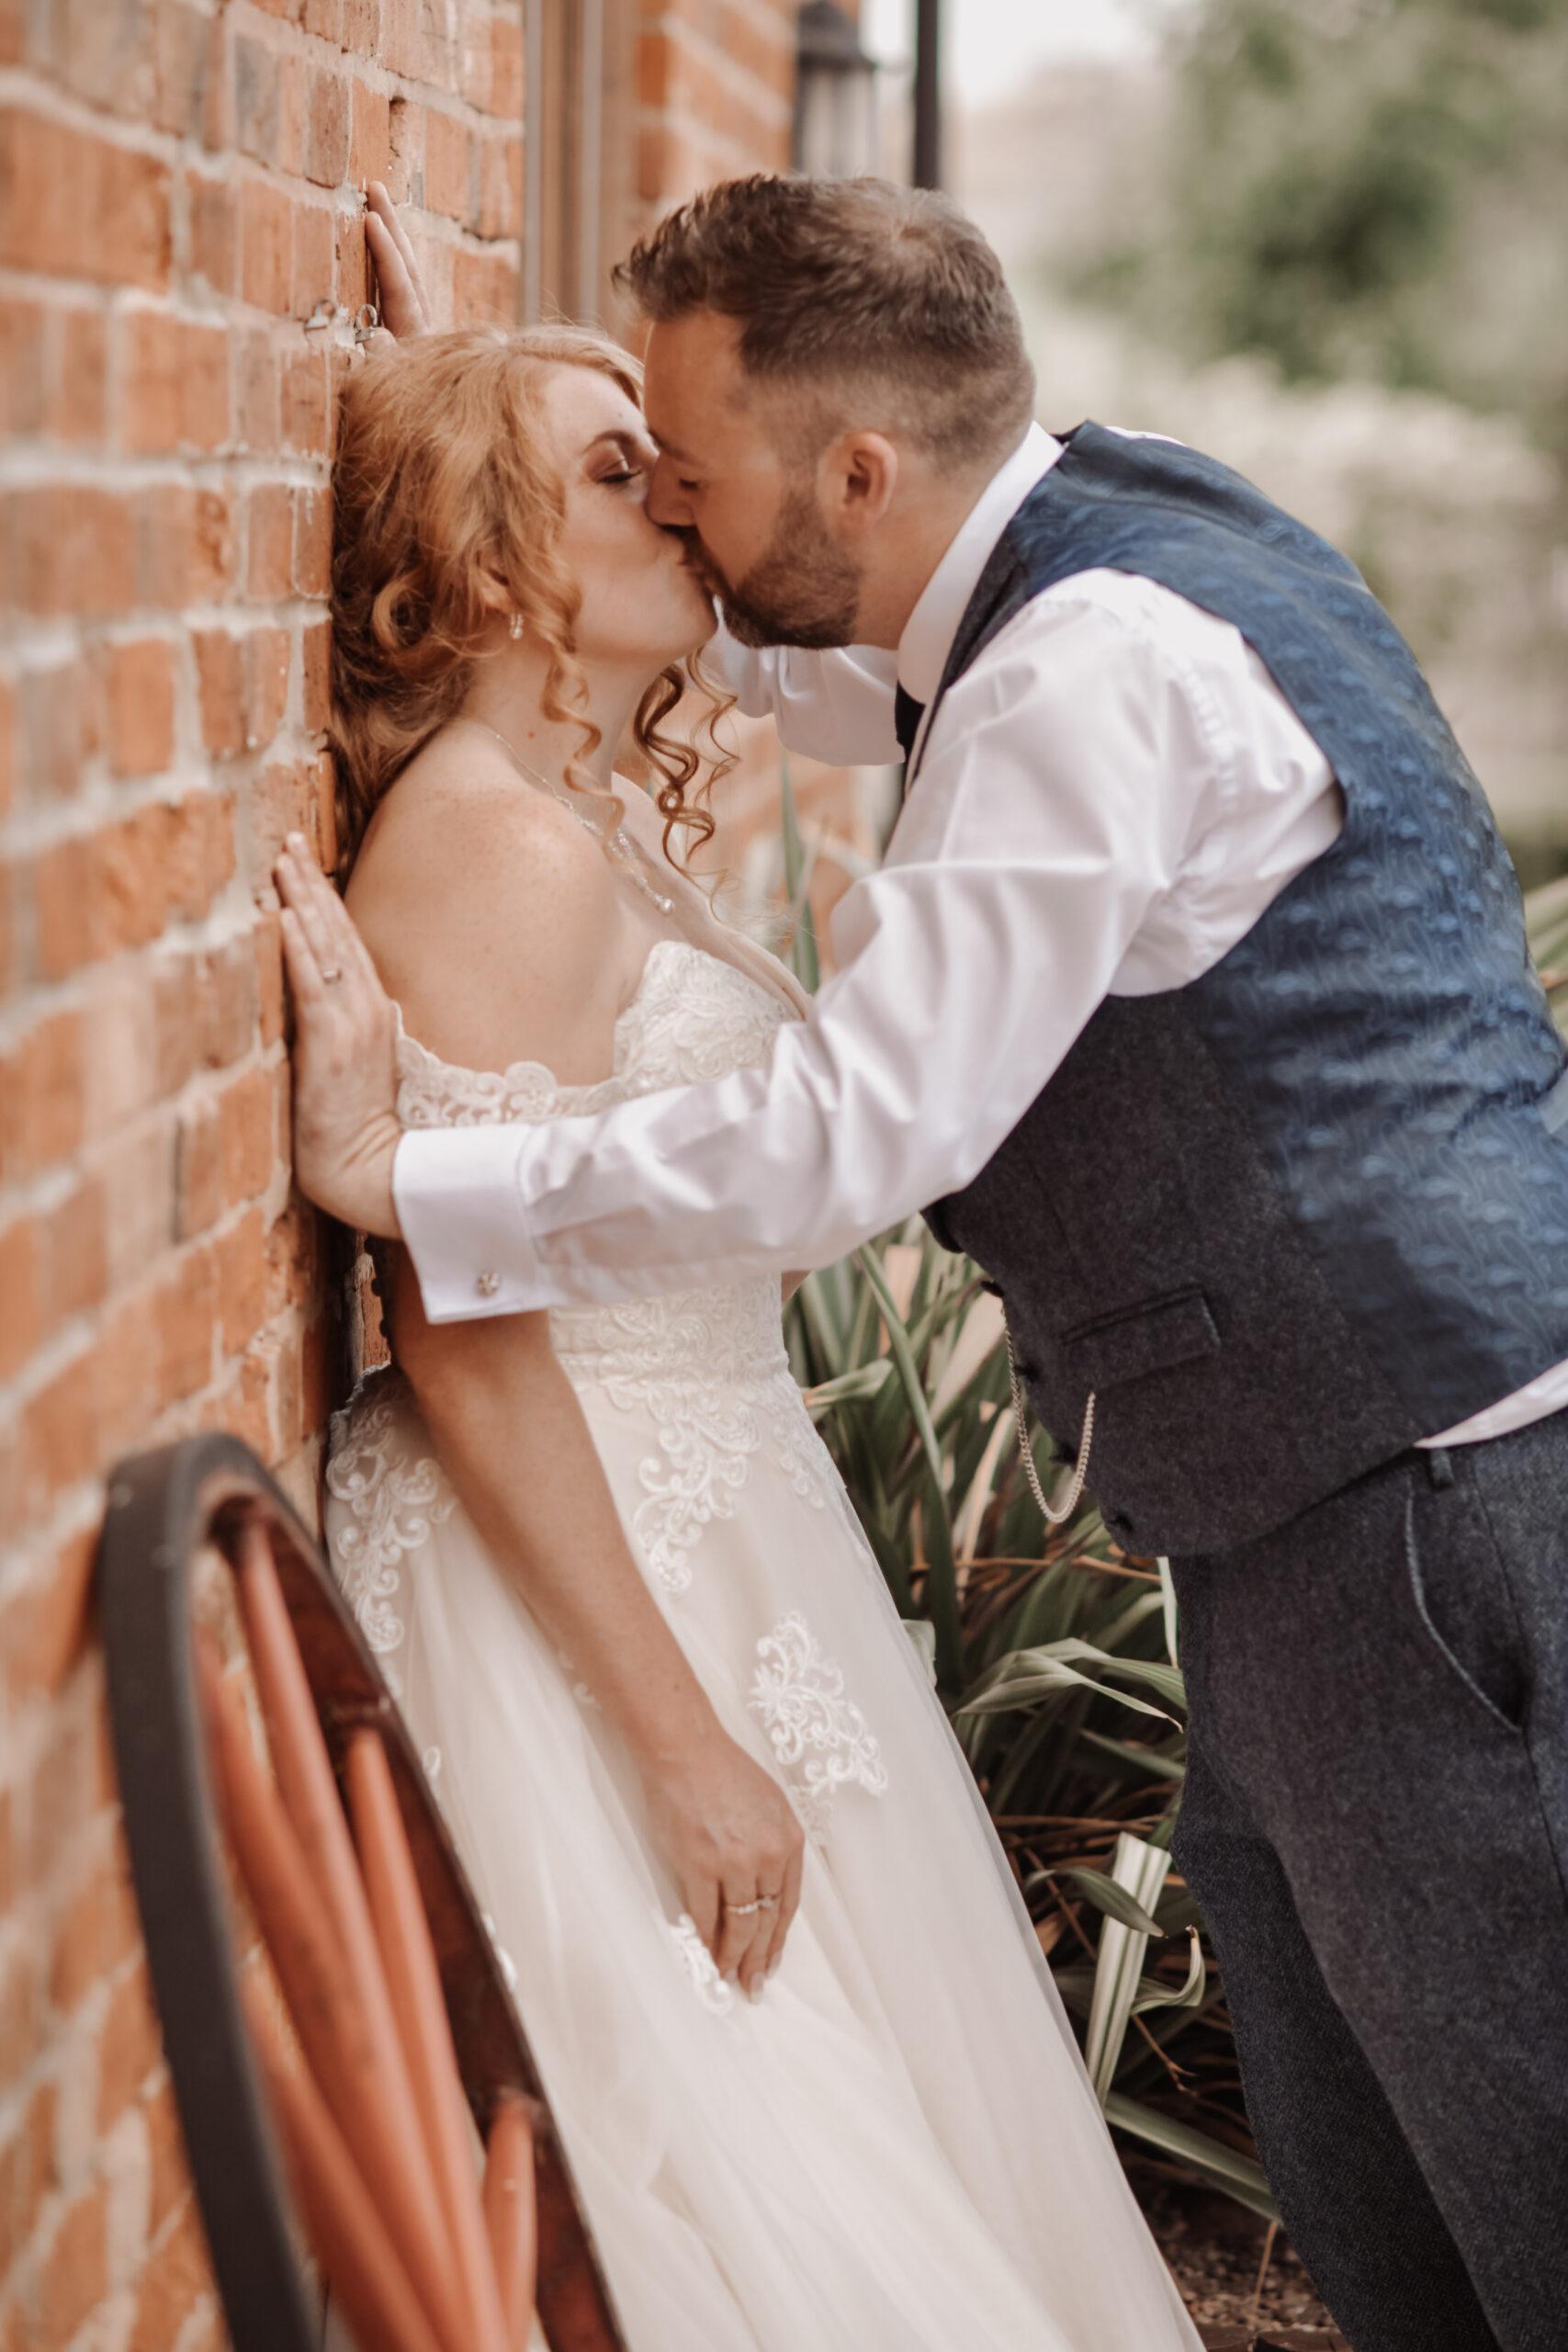 Wedding Video at Wootton Park